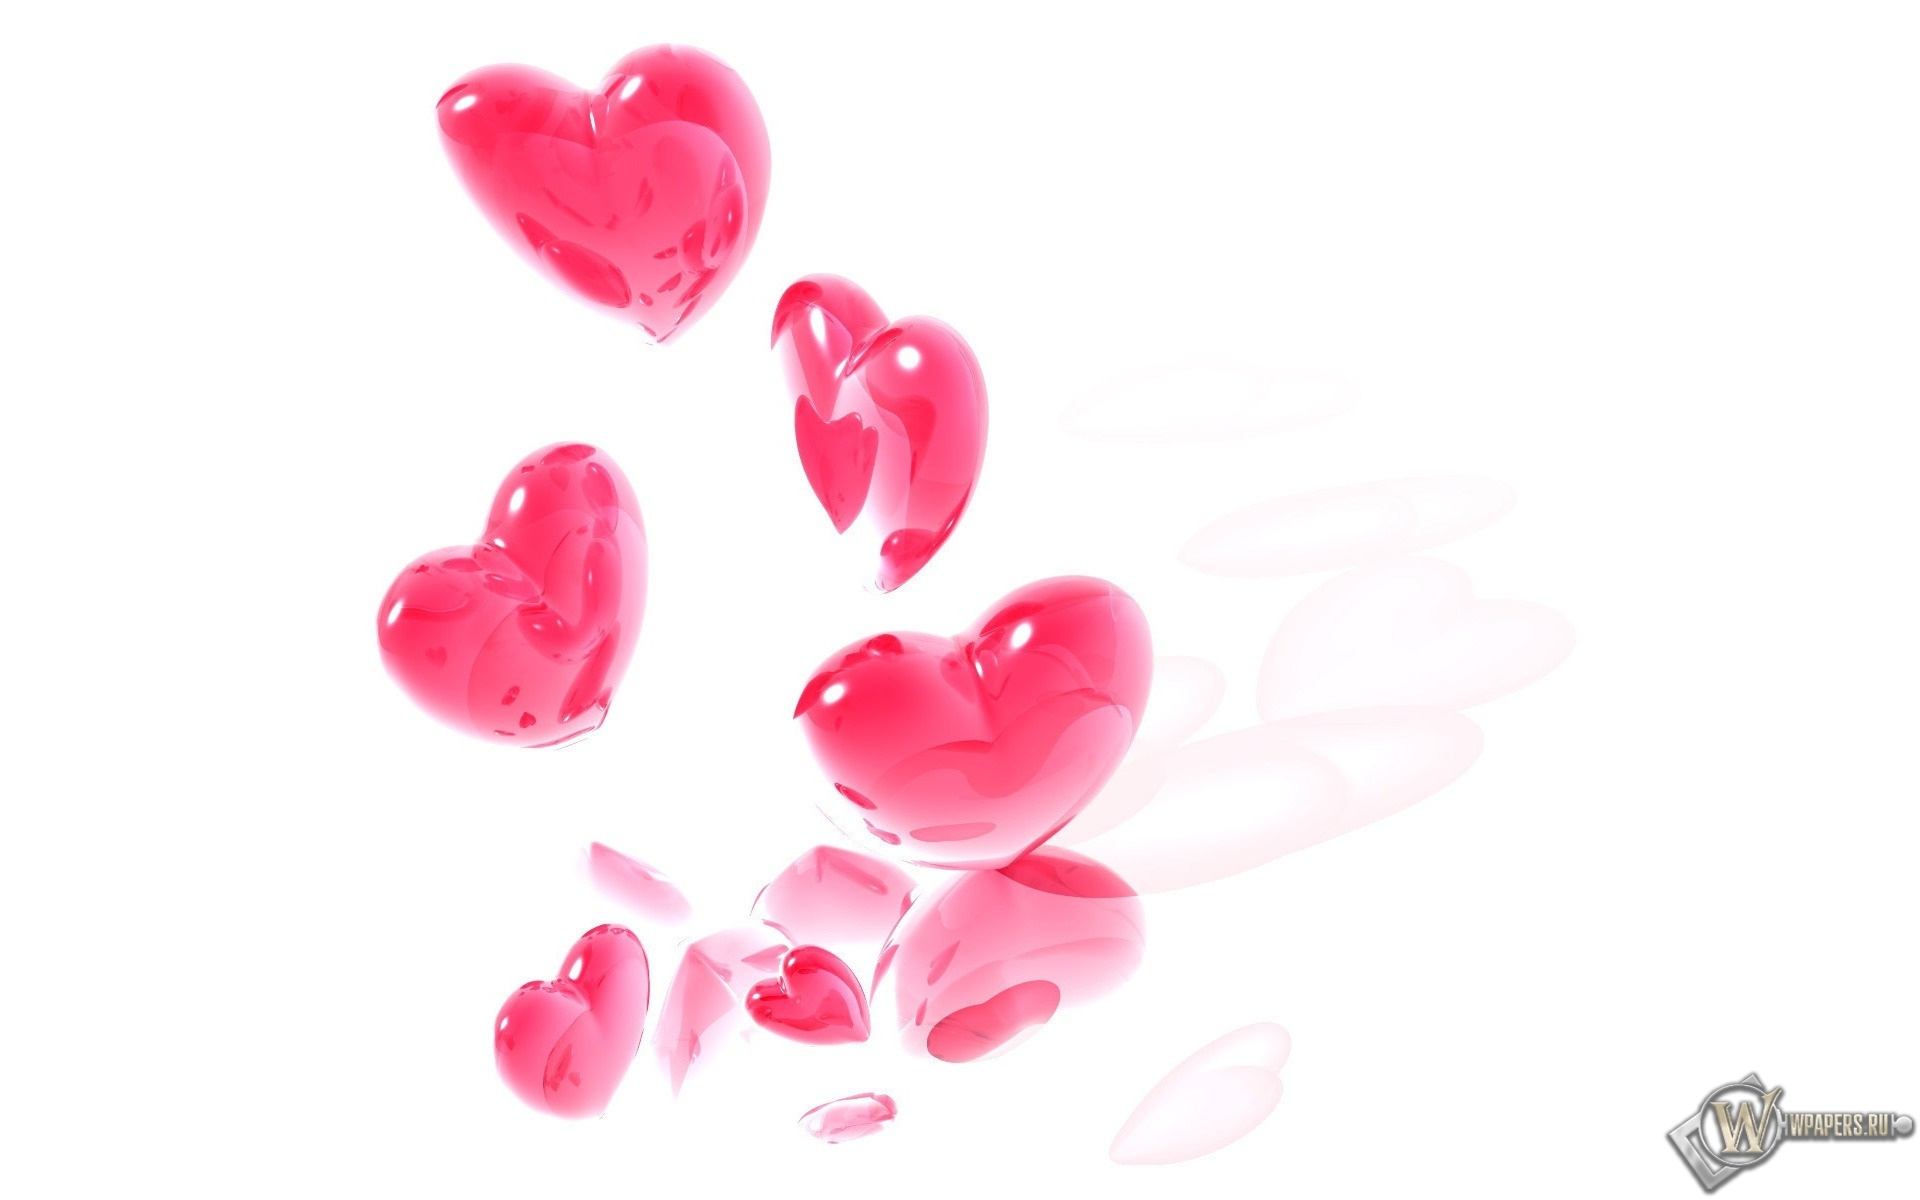 Розовые сердечки 1920x1200